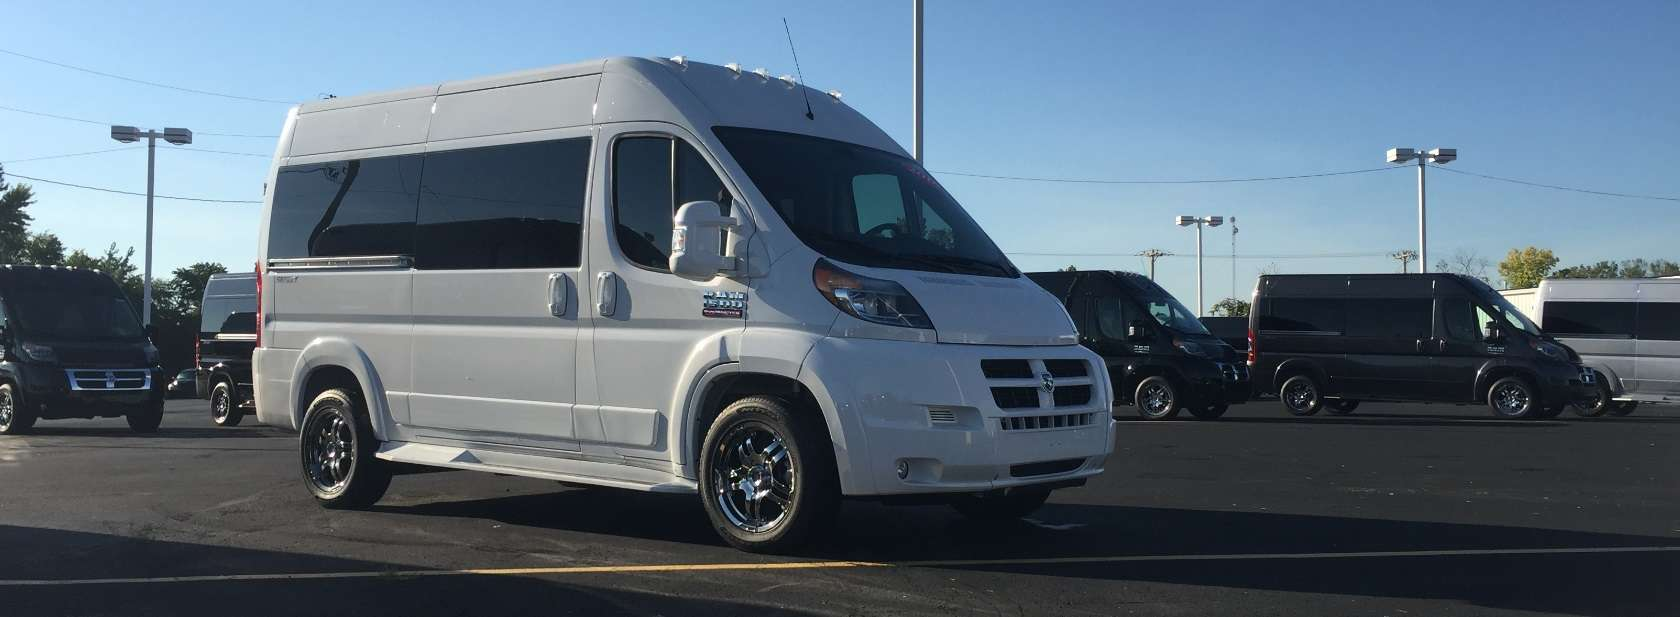 limo vans for sale paul sherry conversion vans. Black Bedroom Furniture Sets. Home Design Ideas